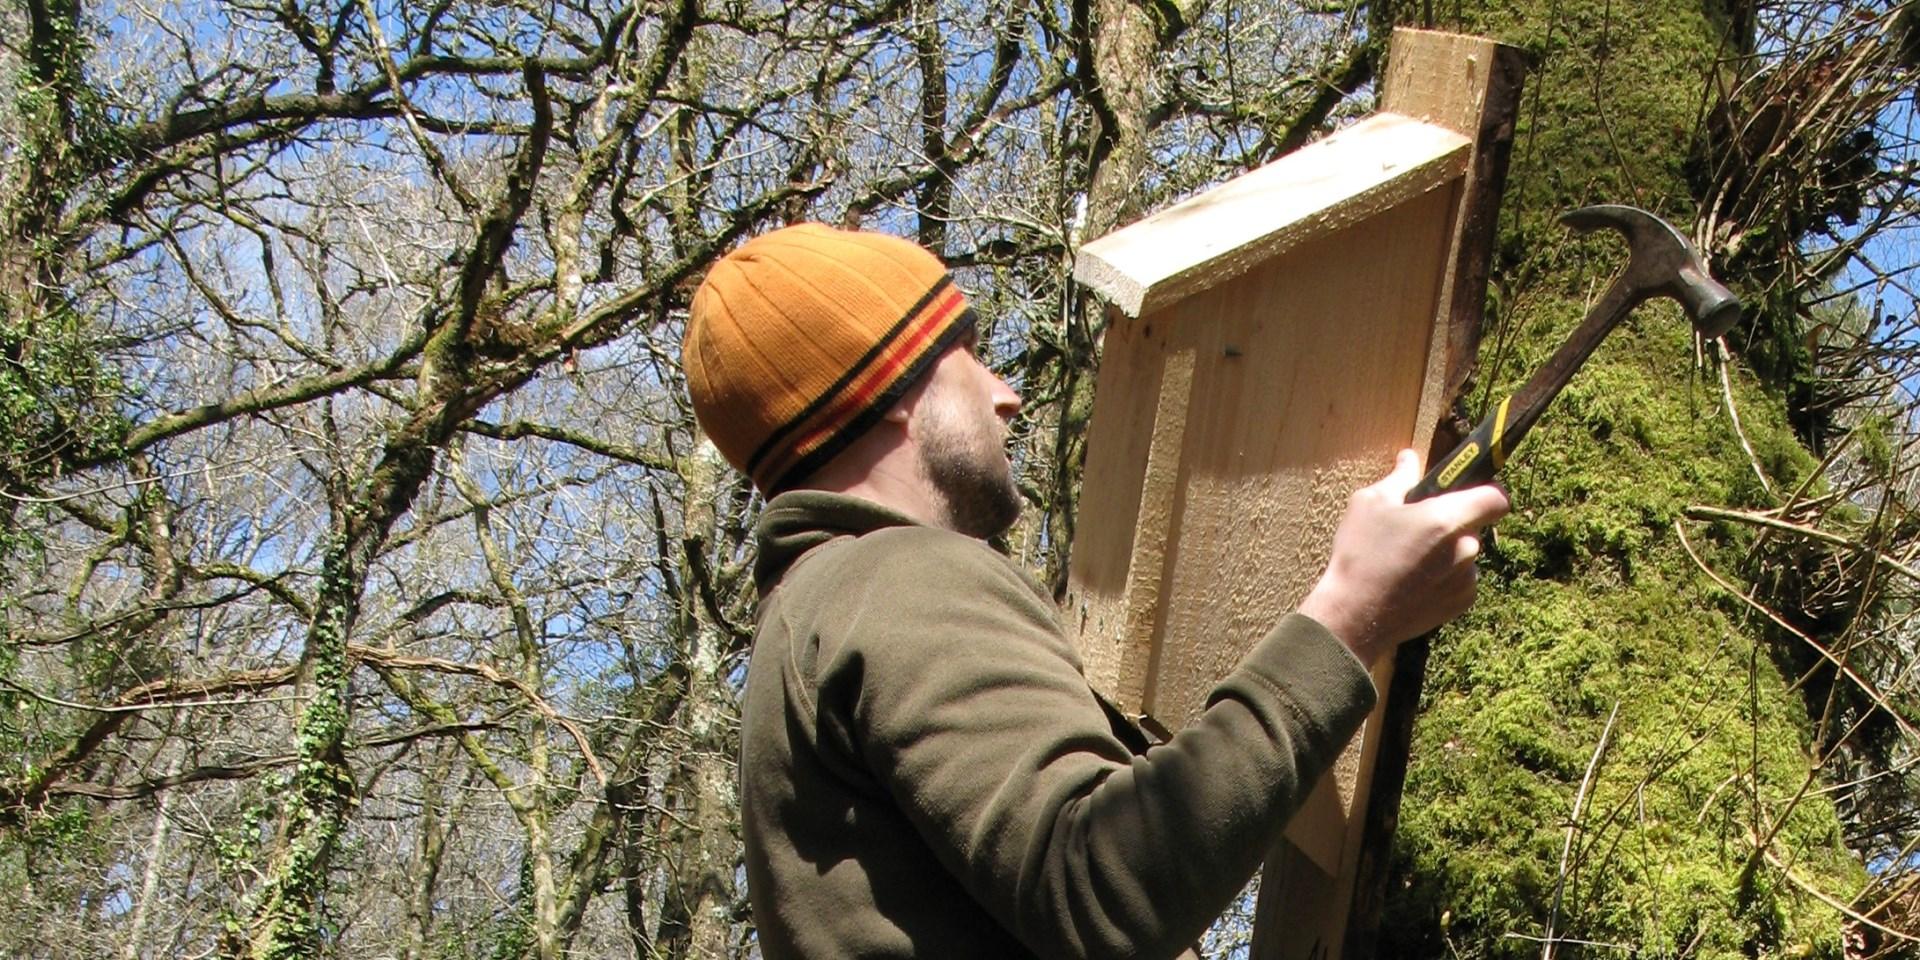 Siting a nest box